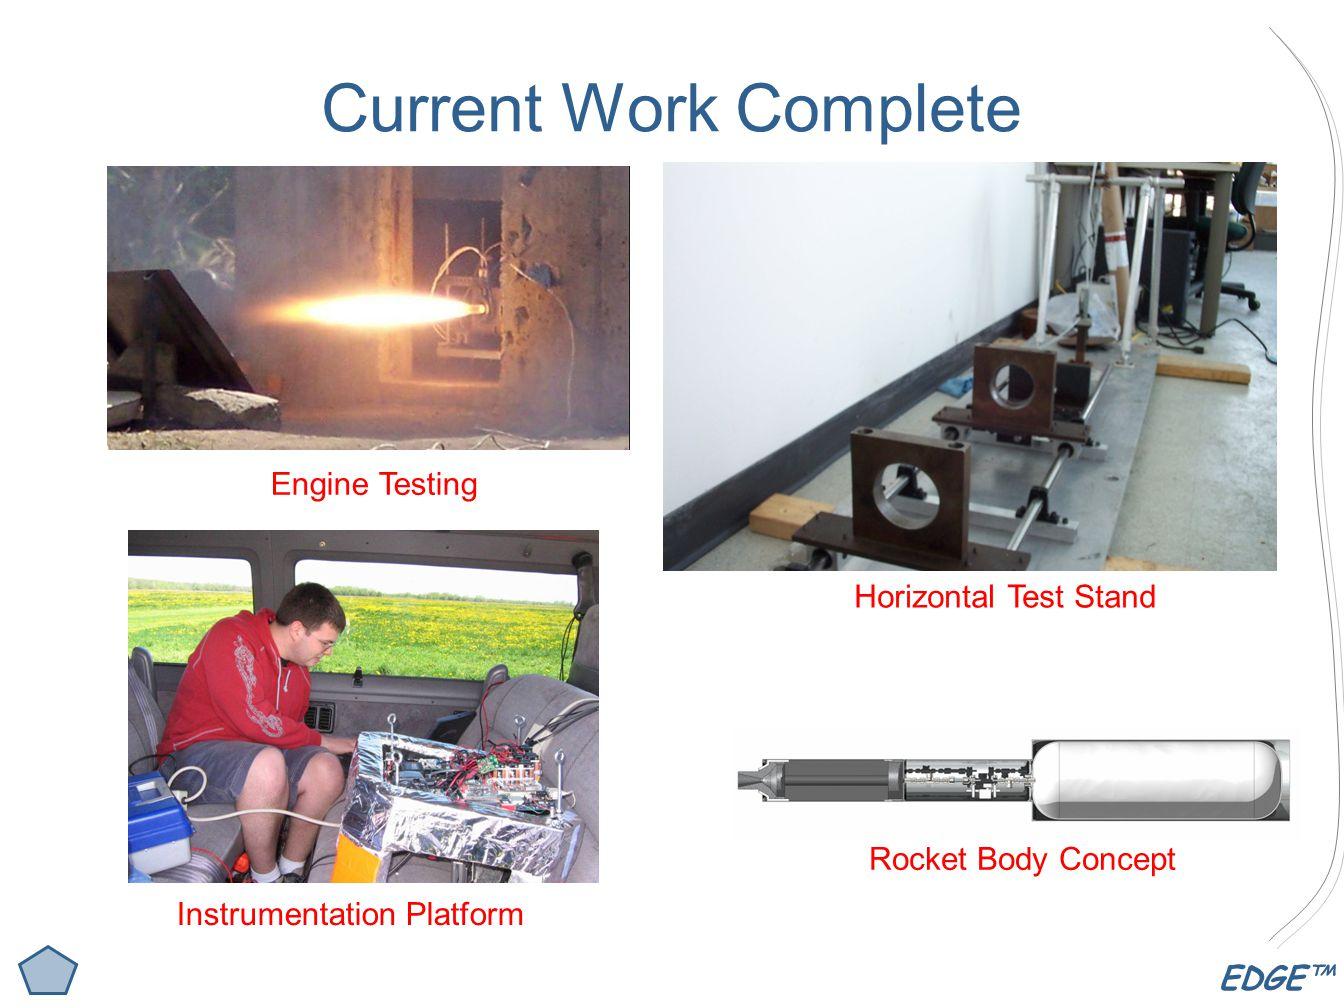 EDGE™ Current Work Complete Rocket Body Concept Horizontal Test Stand Instrumentation Platform Engine Testing